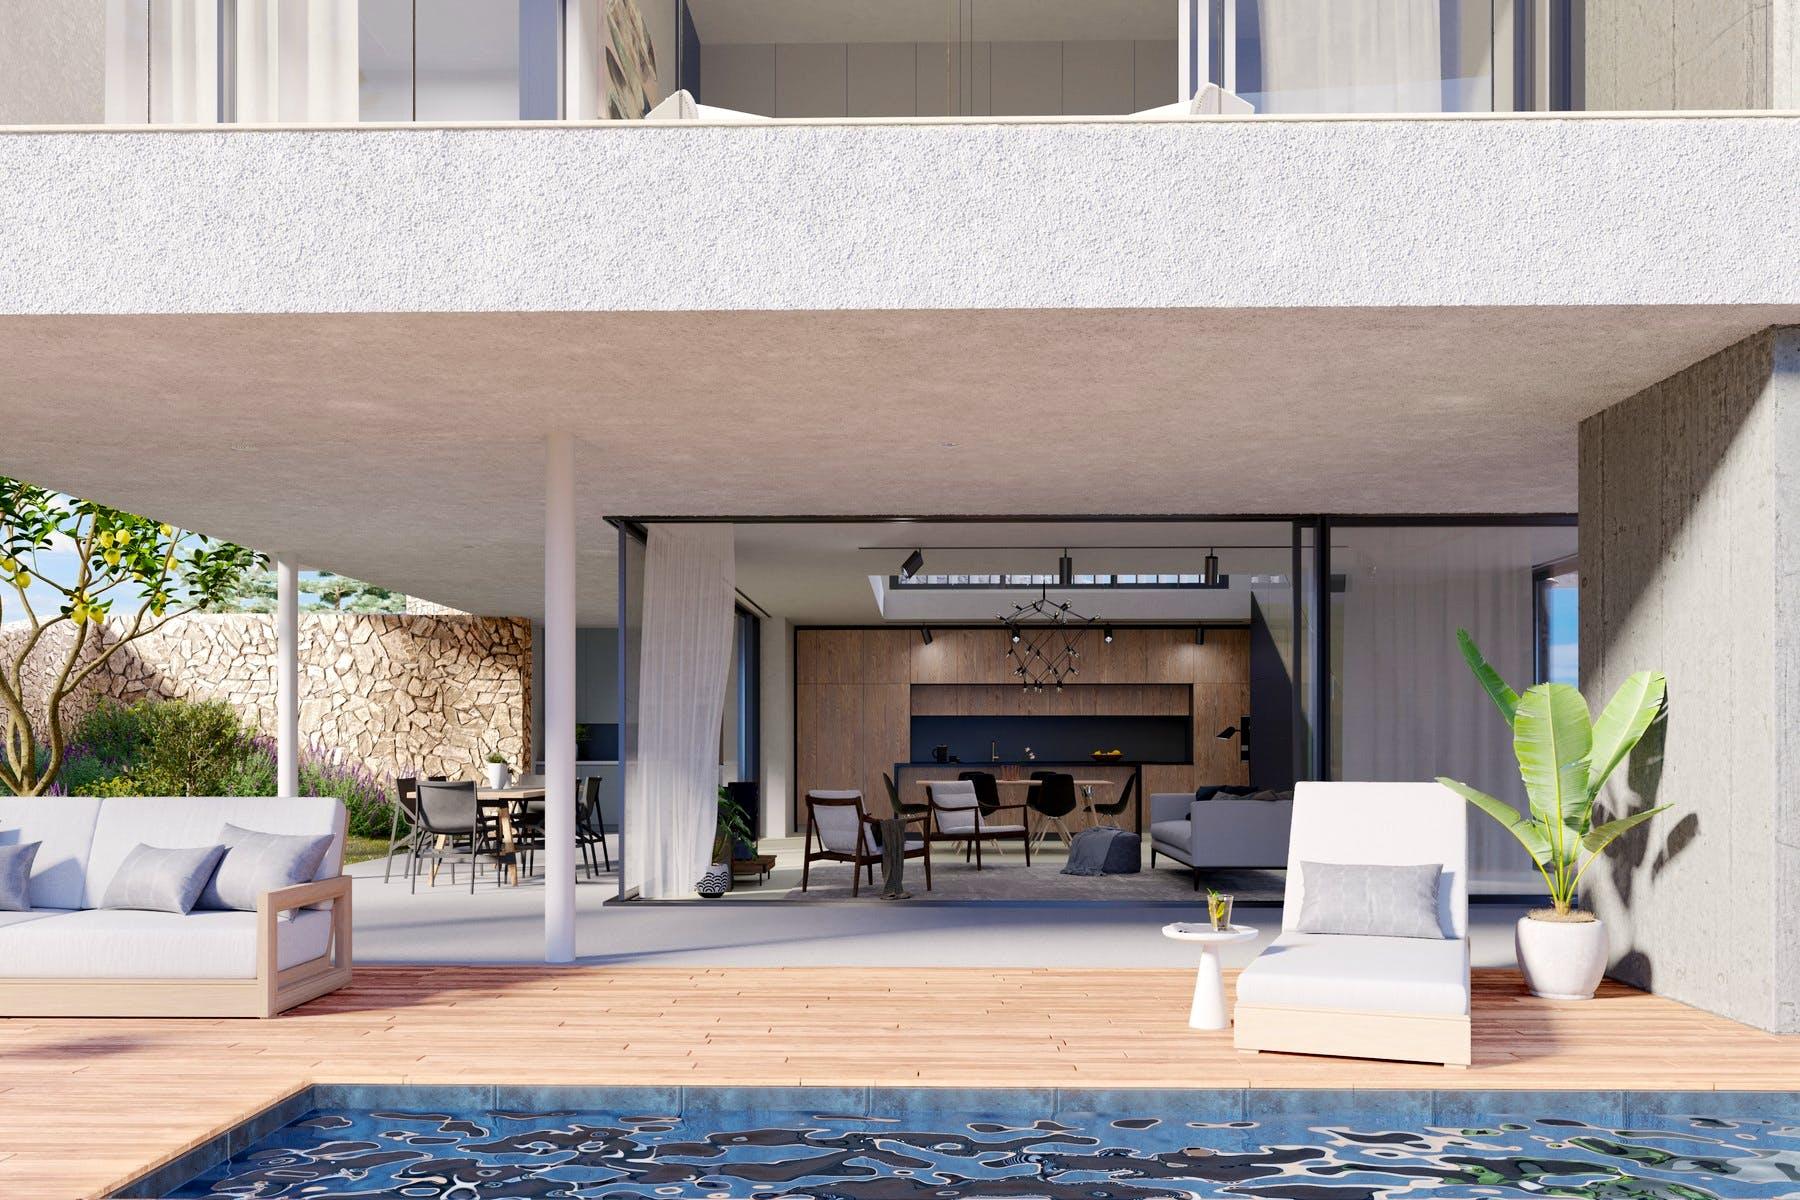 Spacious poolside terrace